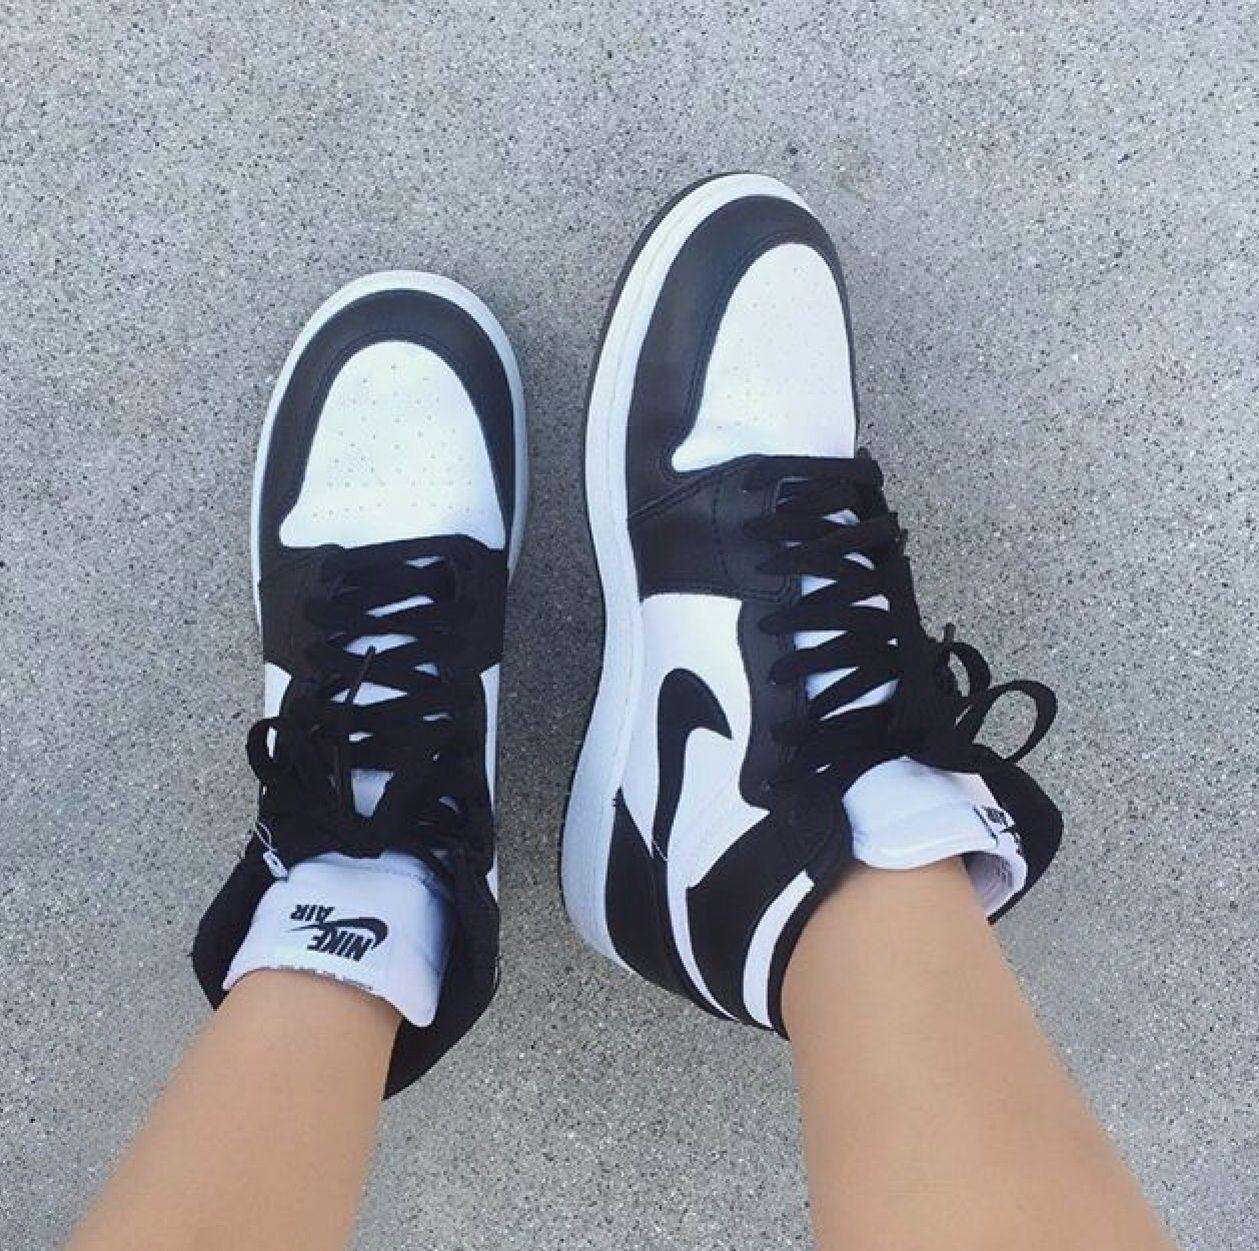 shoes. image by madison woods   Nike shoes blue, White nike